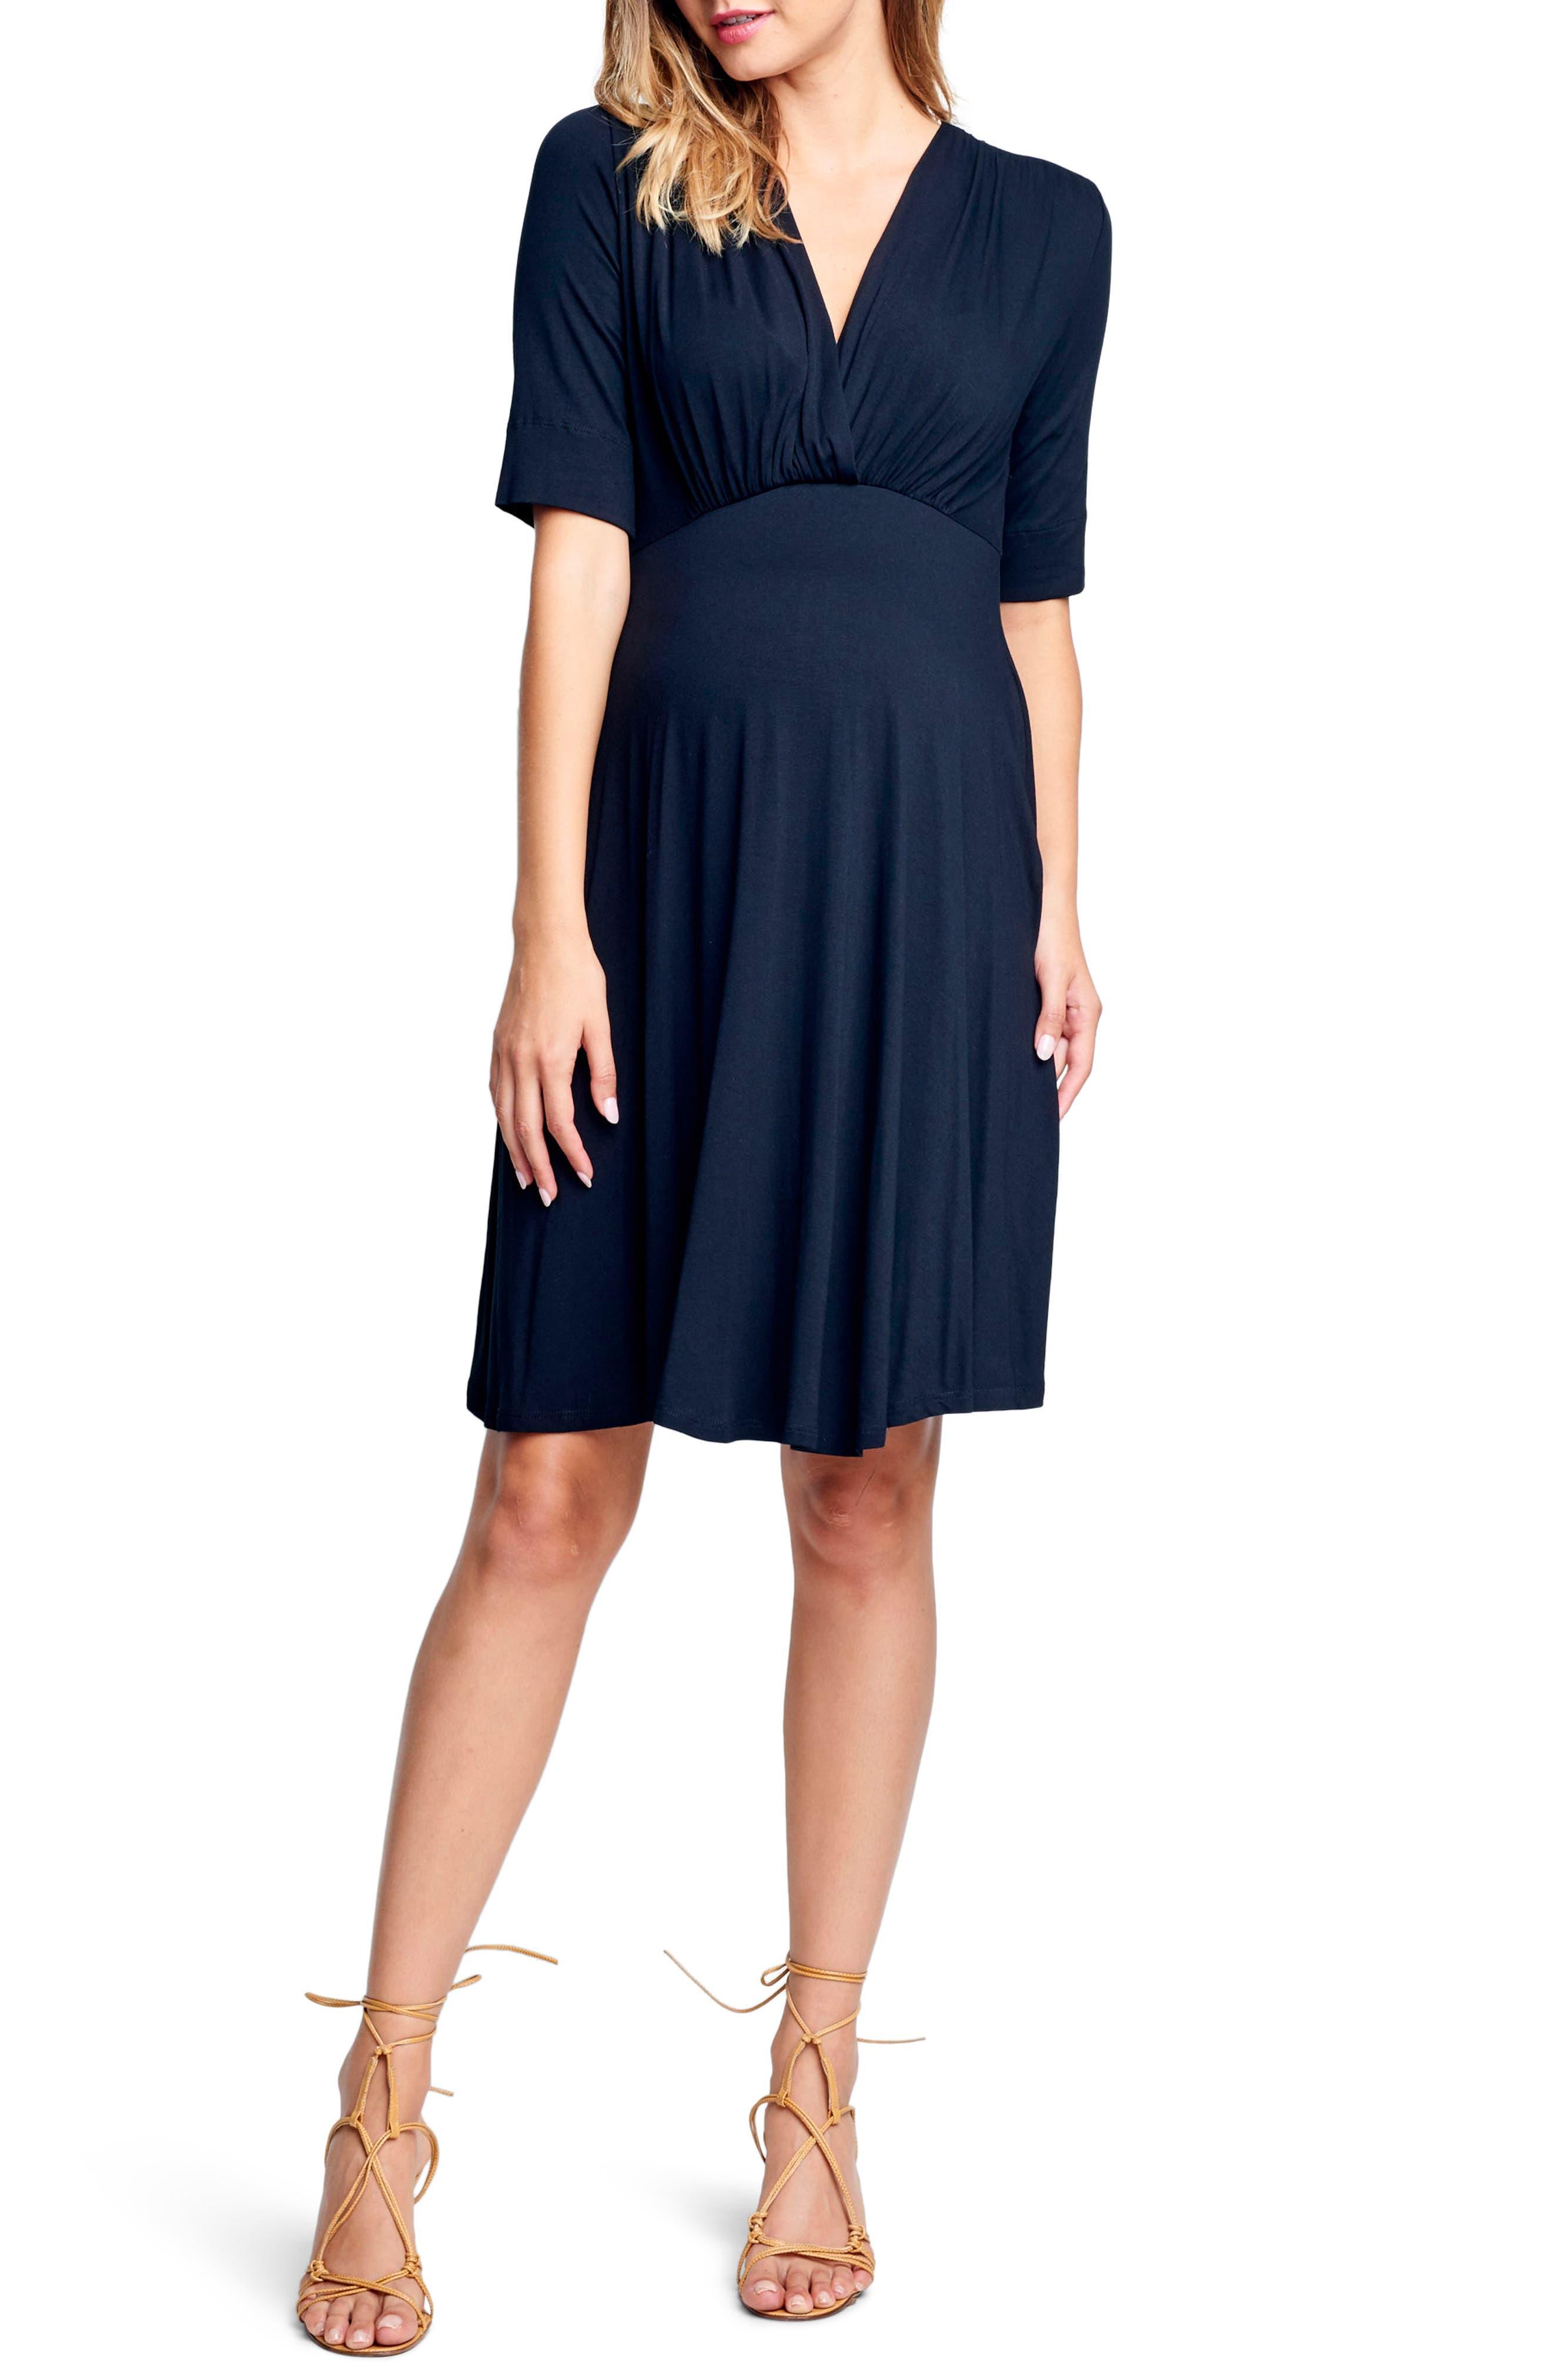 MATERNAL AMERICA Empire Waist Stretch Maternity Dress, Main, color, 001